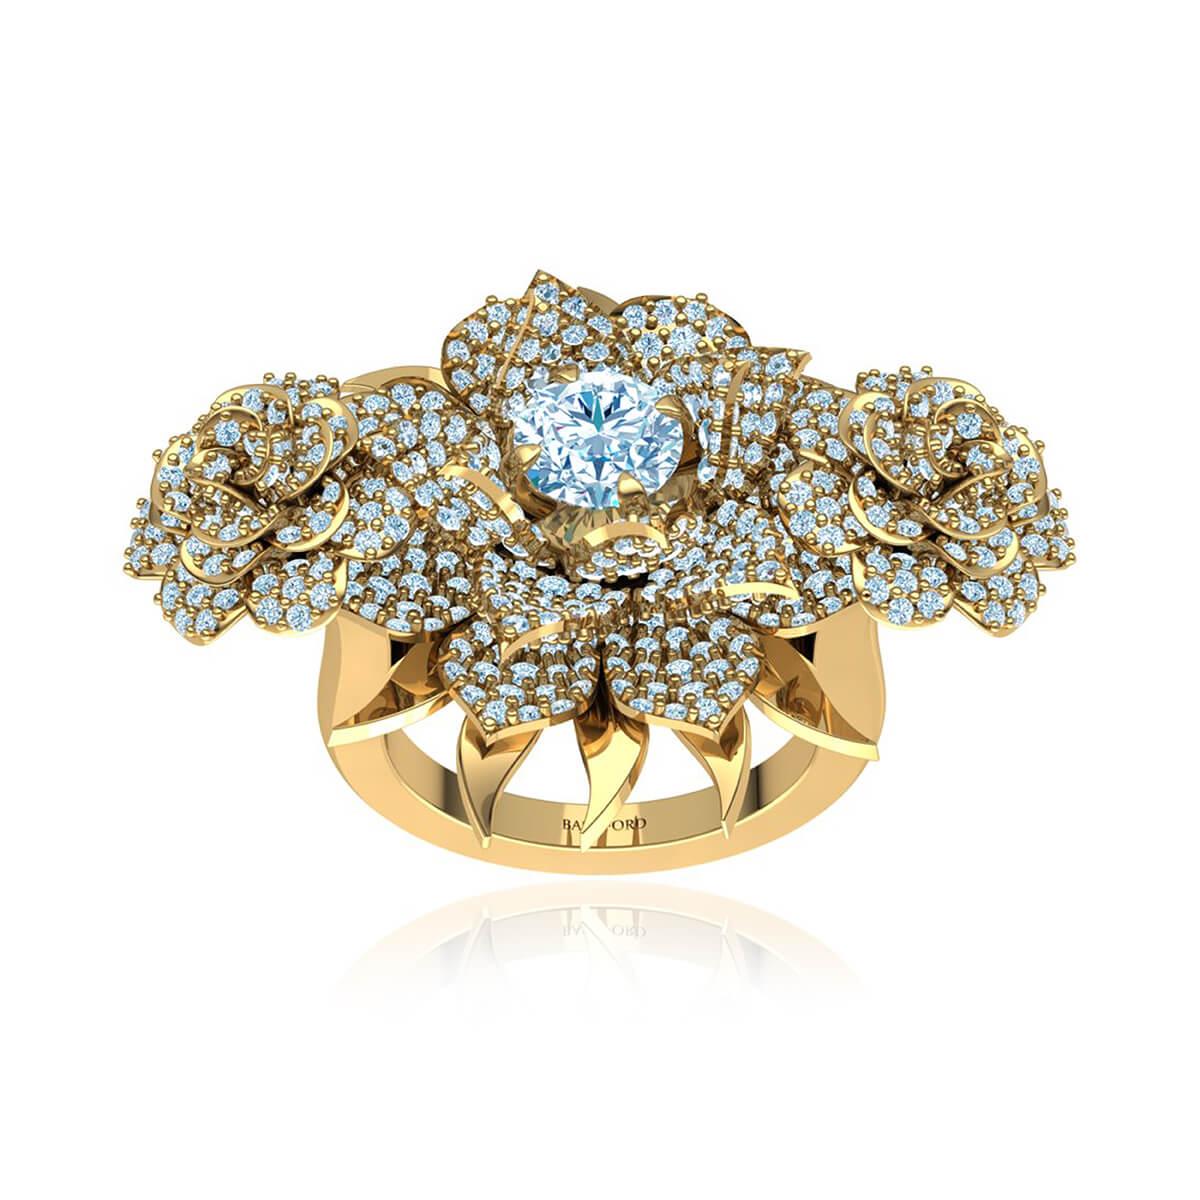 The Magnolia Diamond Ring